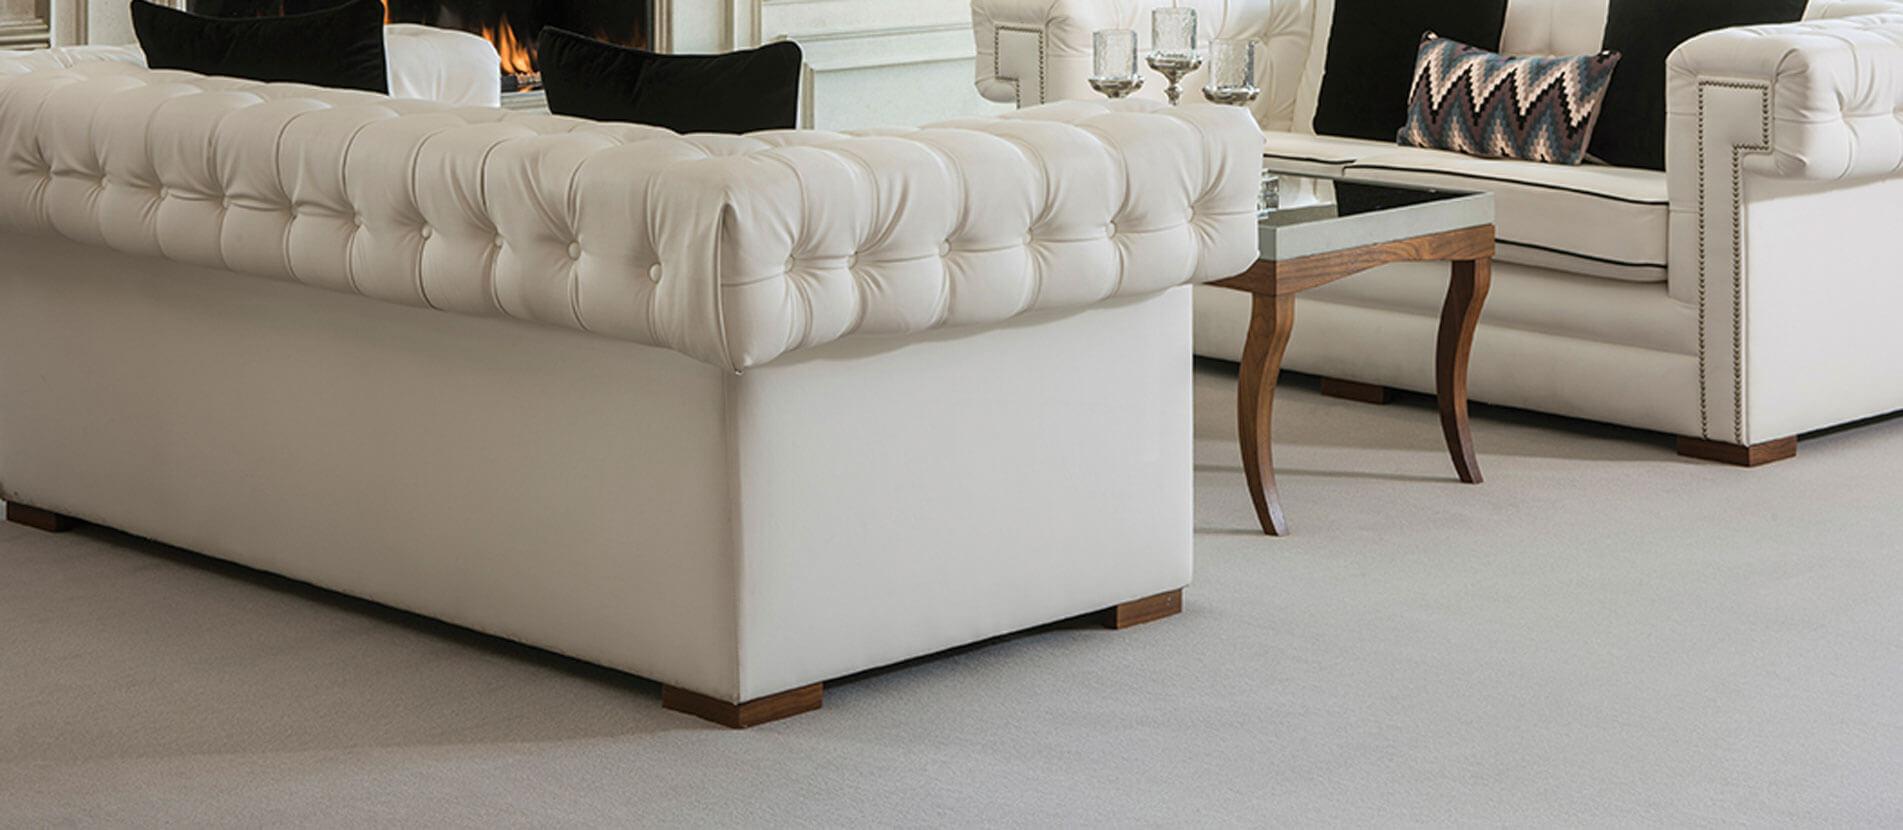 Luxury Carpeting